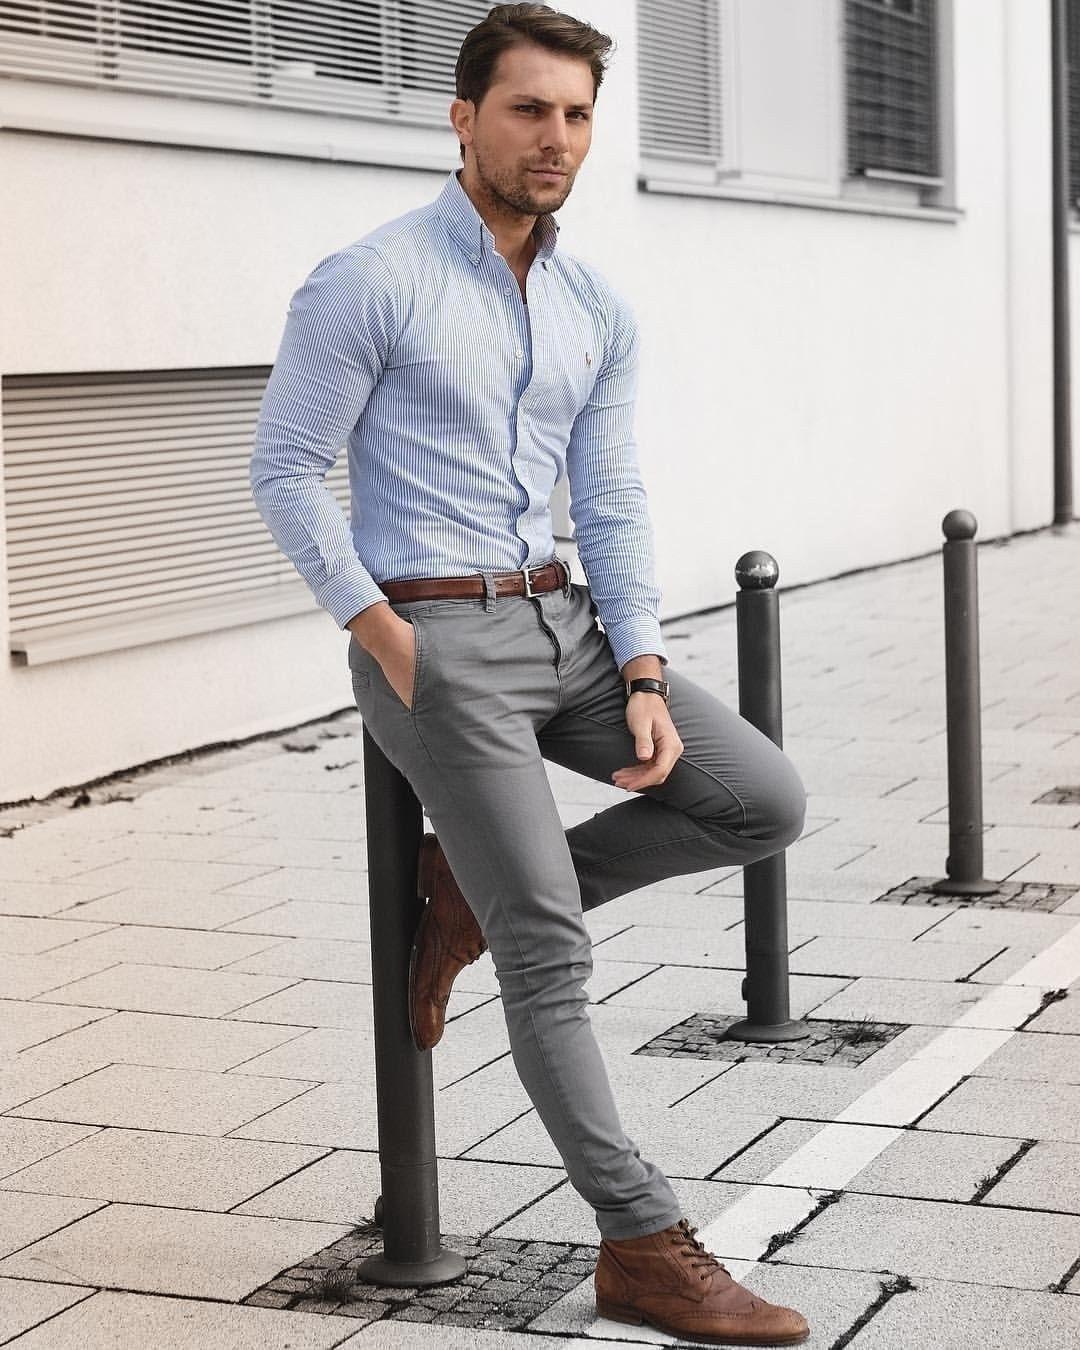 attire, Formal mens fashion